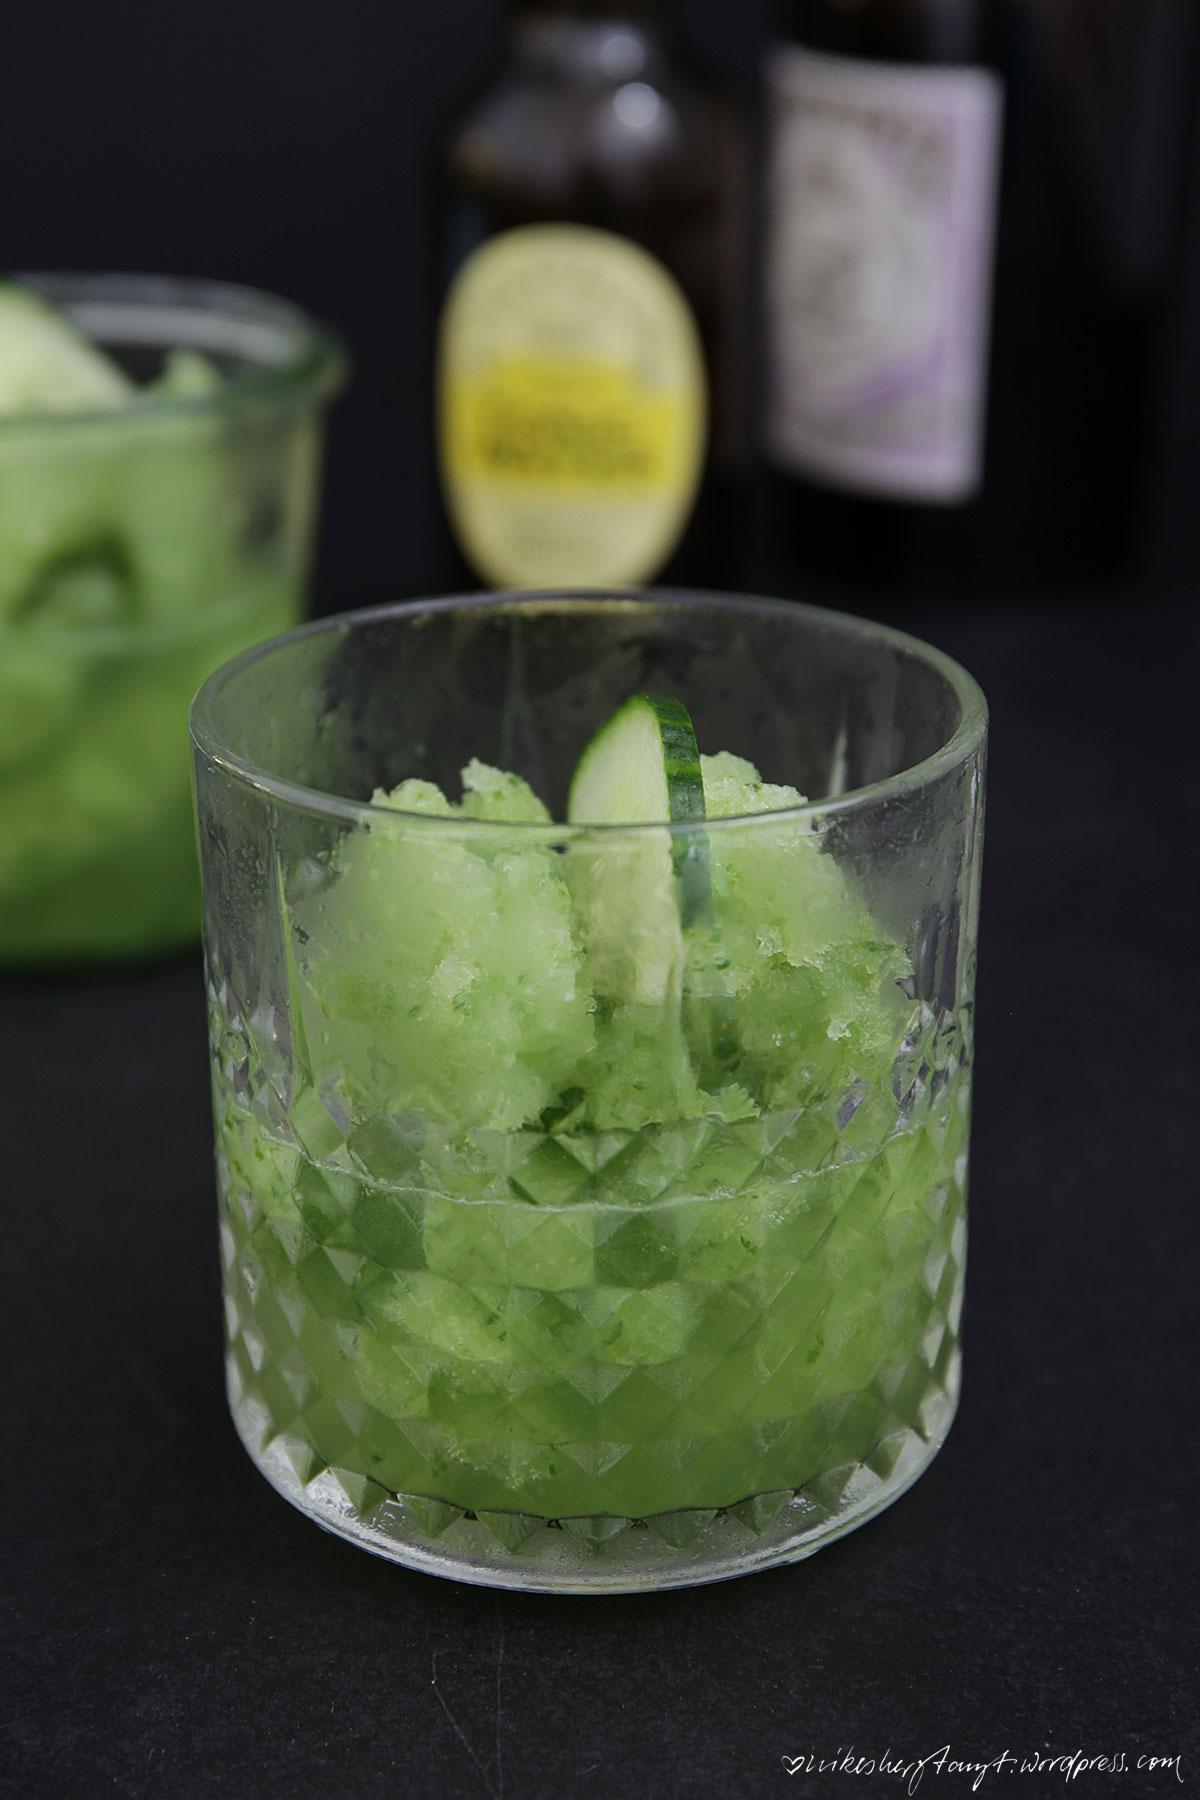 gin und tonic, gin and tonic, gurke, cucumber, frozen, drink, nikesherztanzt